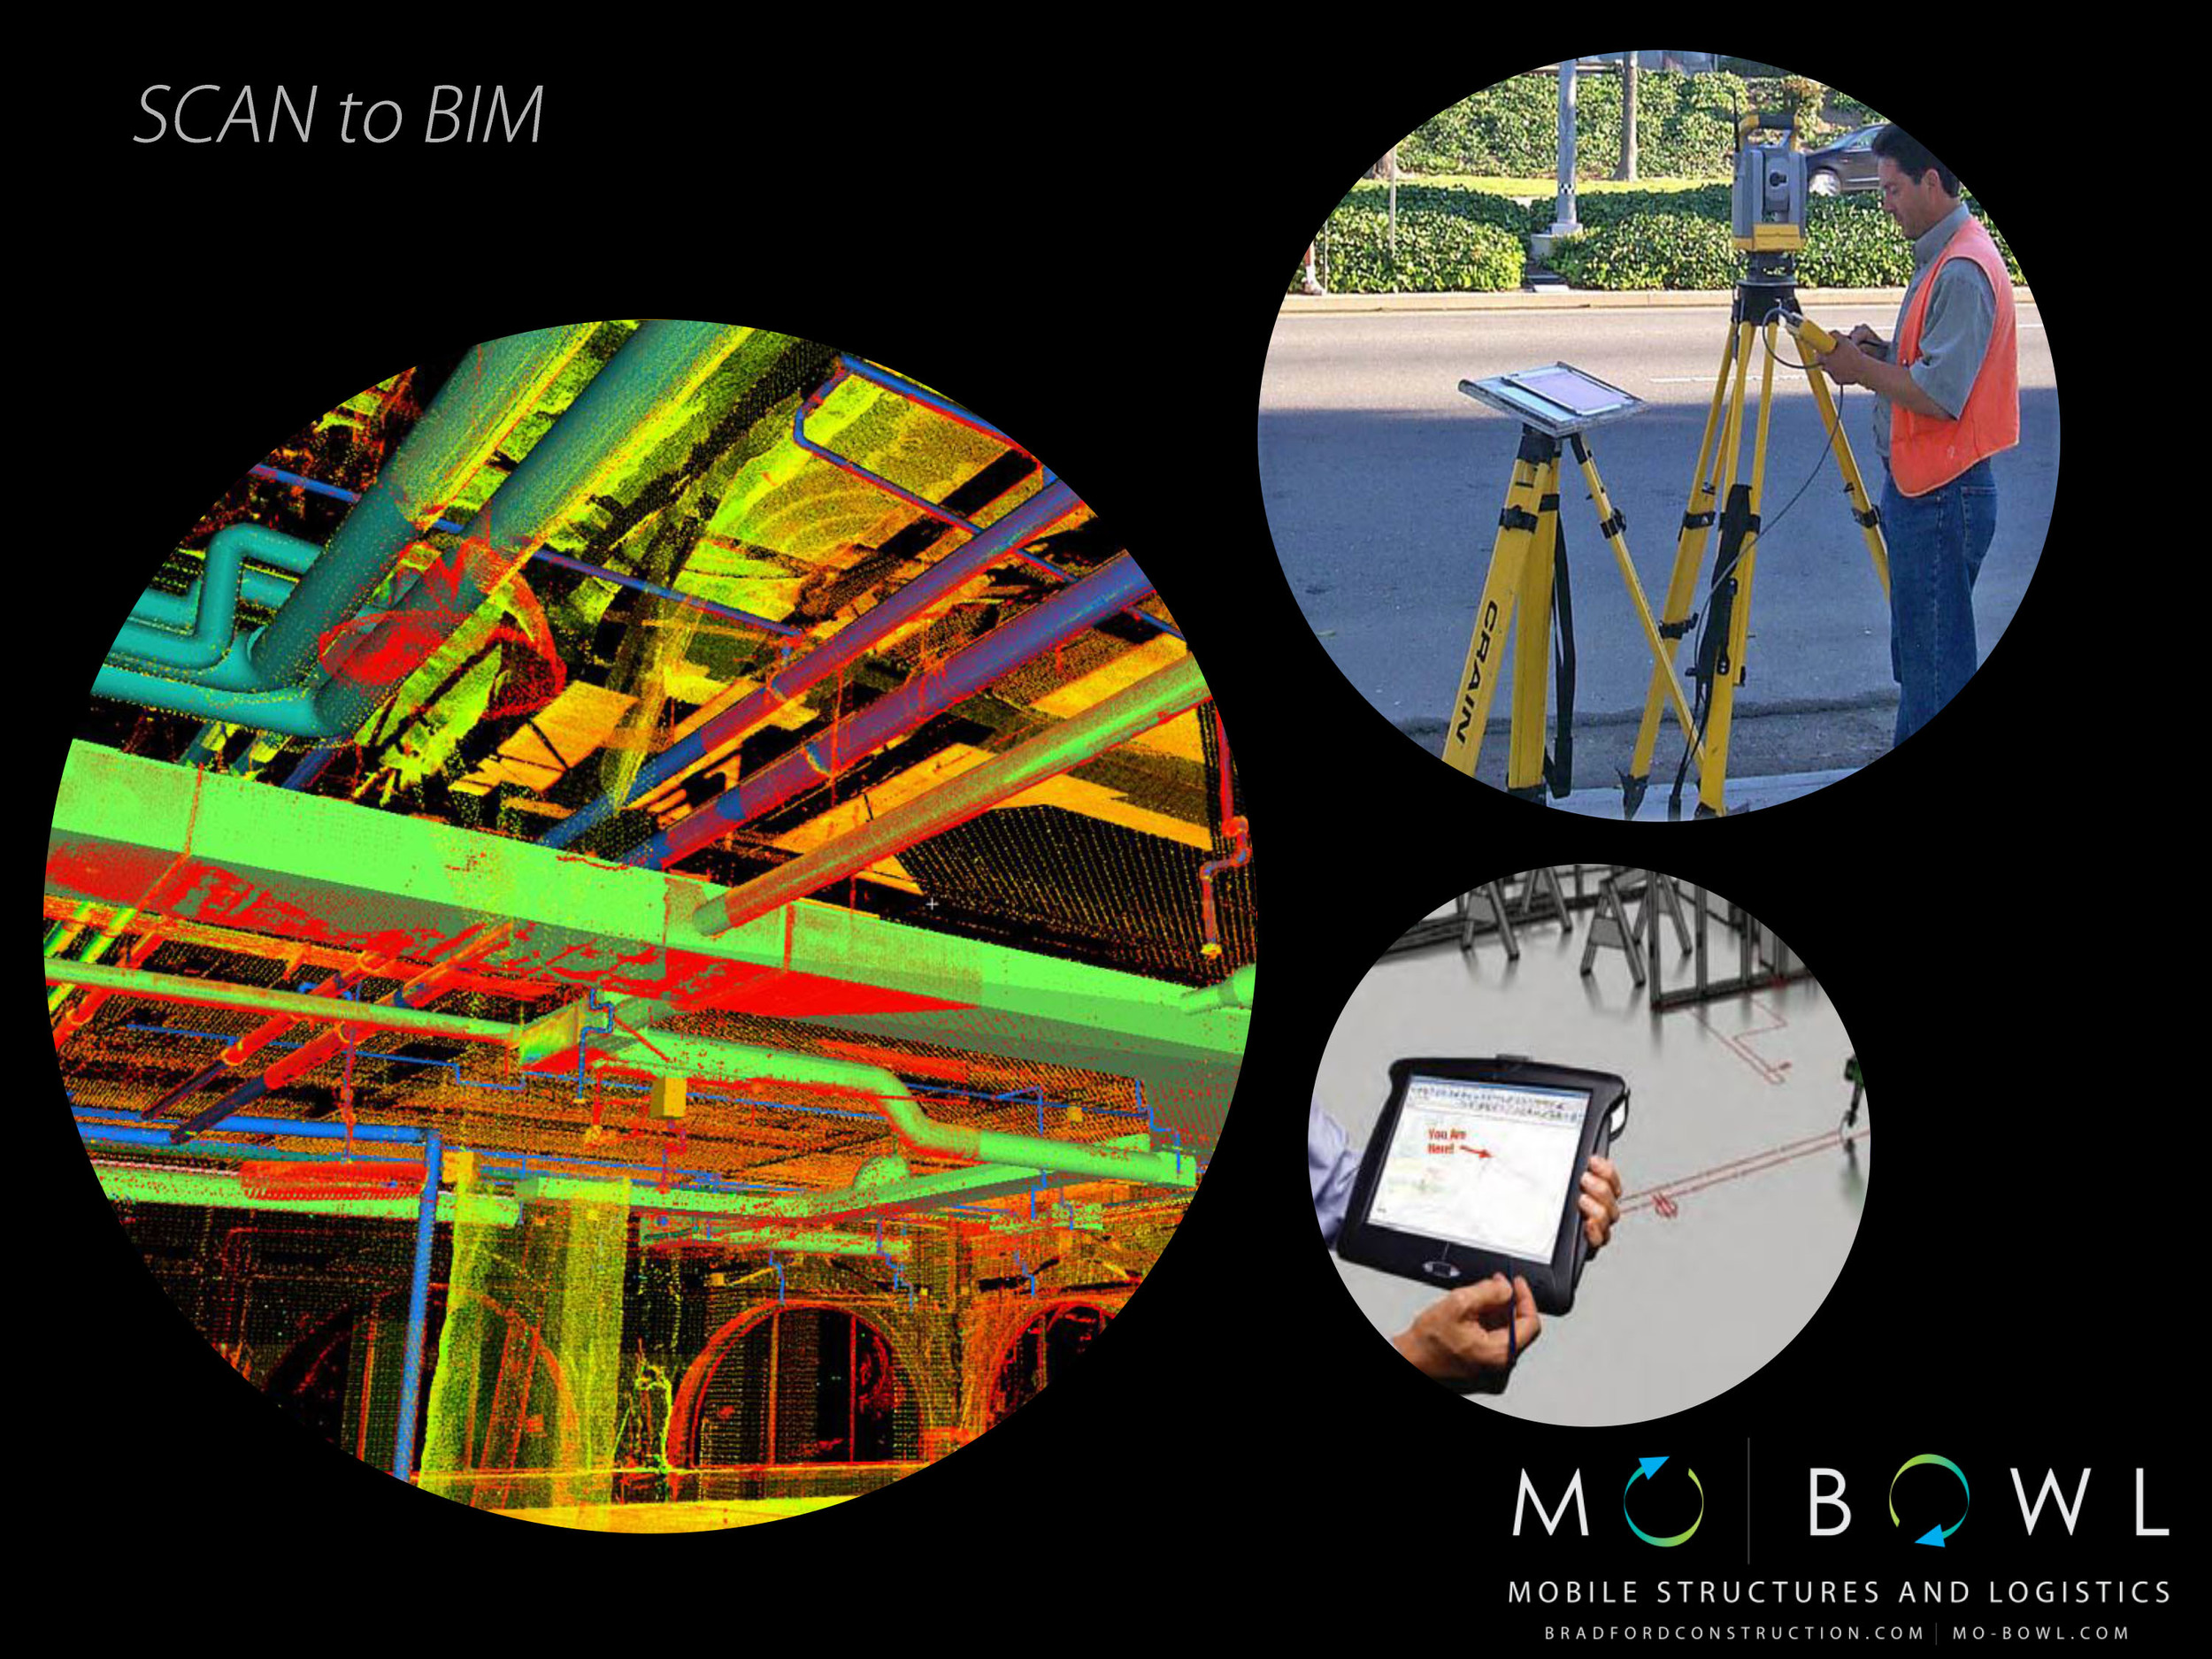 Mobowl_Presentation_final_Ver-17 copy.jpg